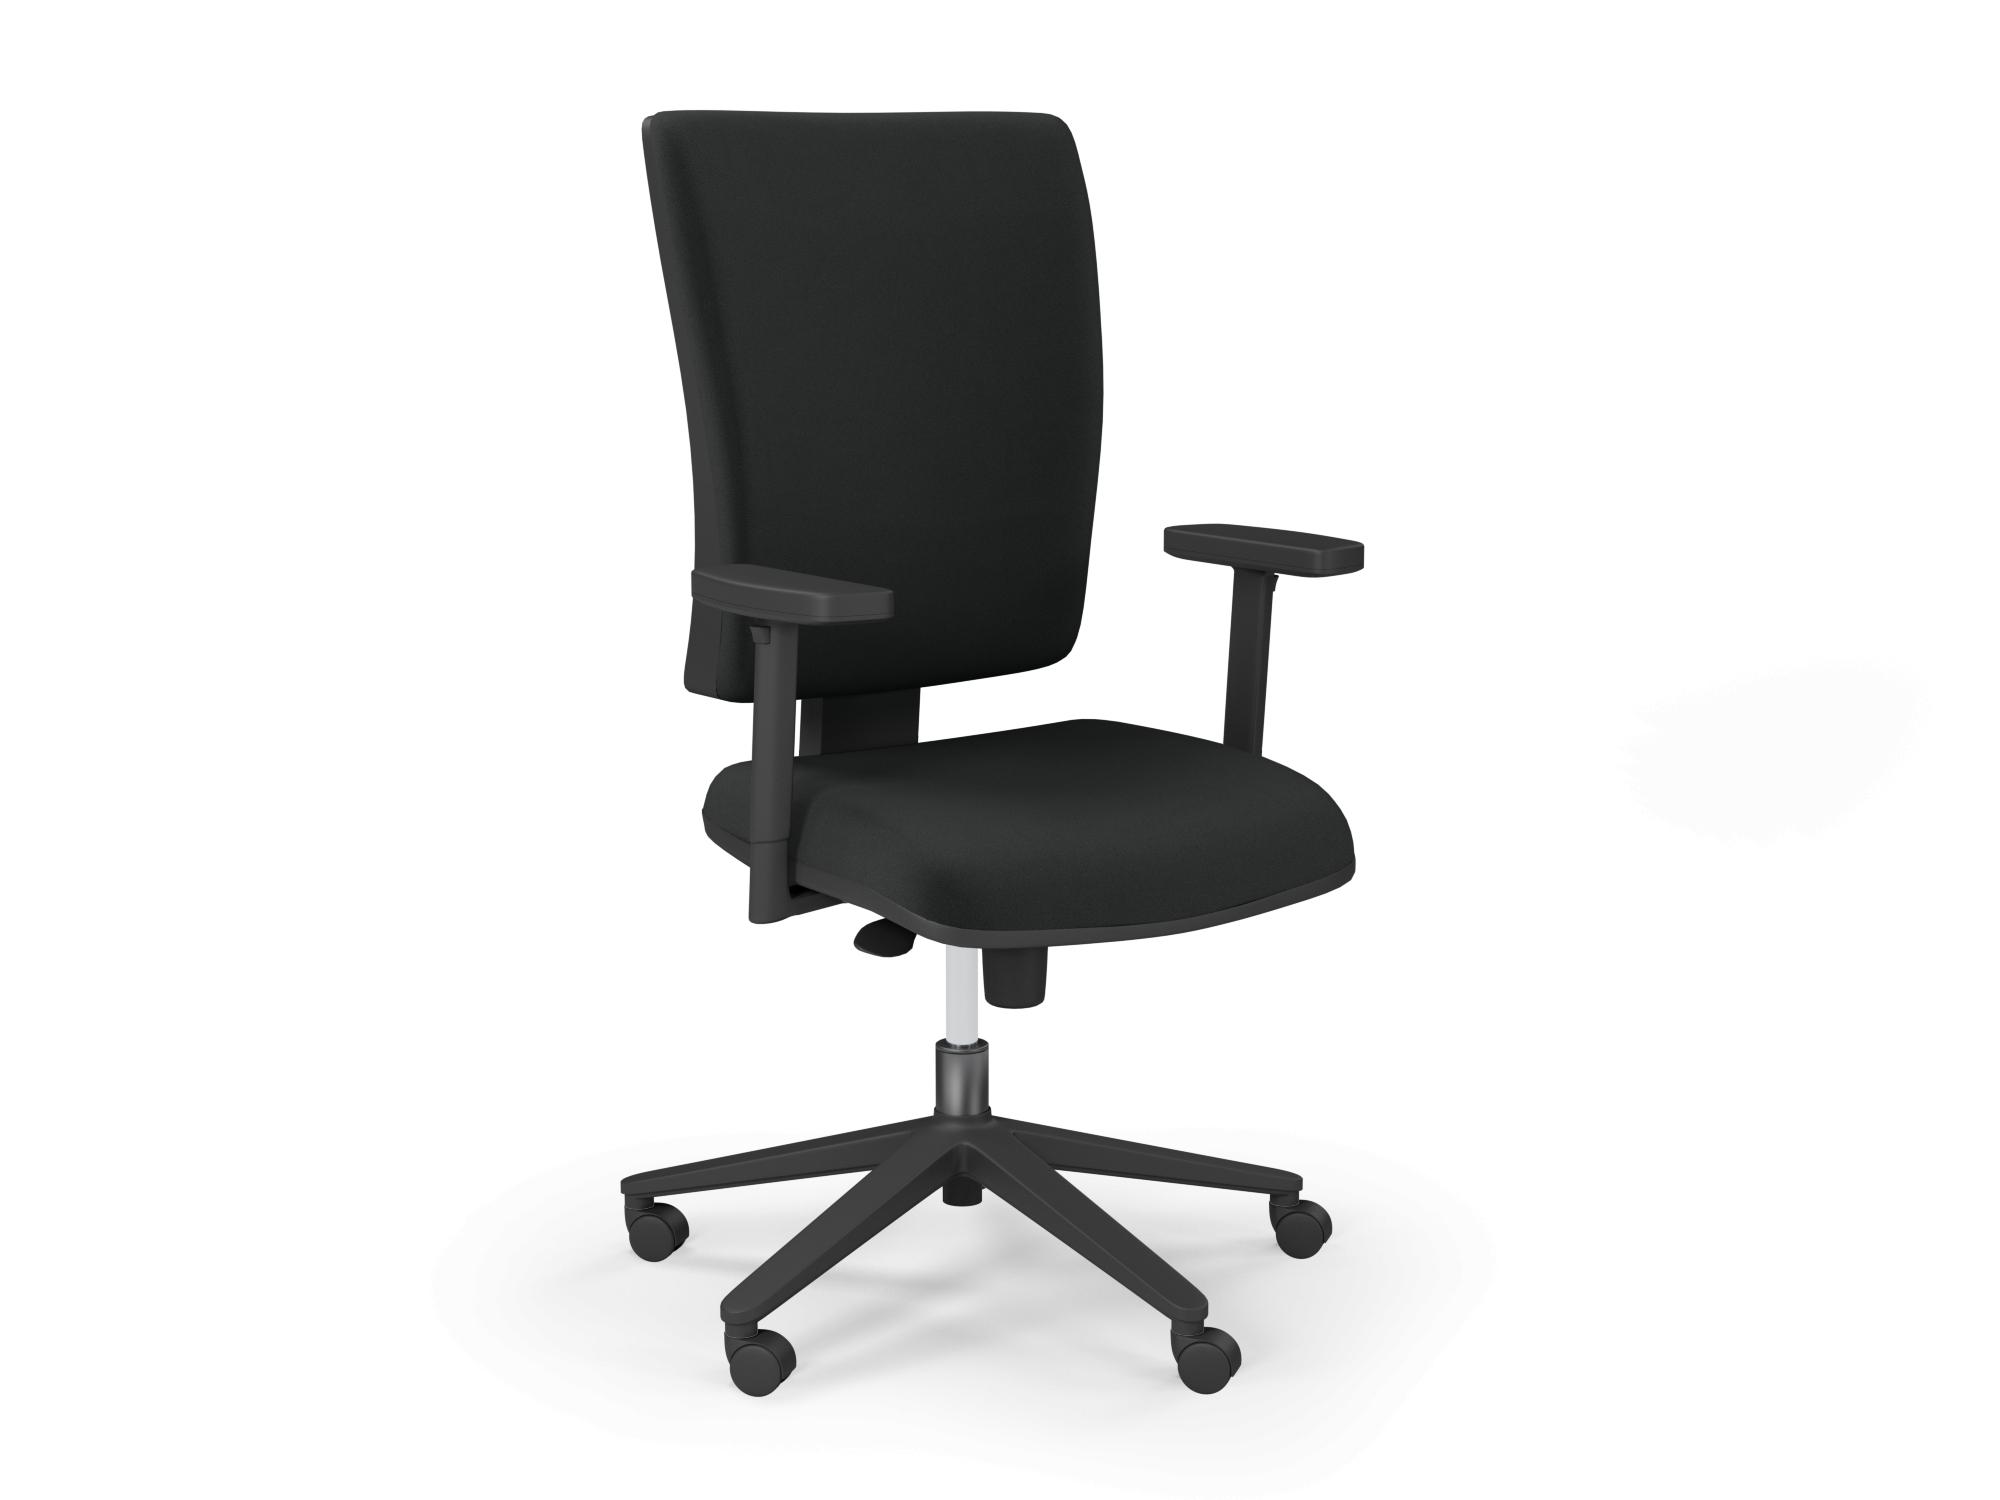 O. Flash High Fabric Back Blk Base Seat Slide Step PP - Evert Black E001